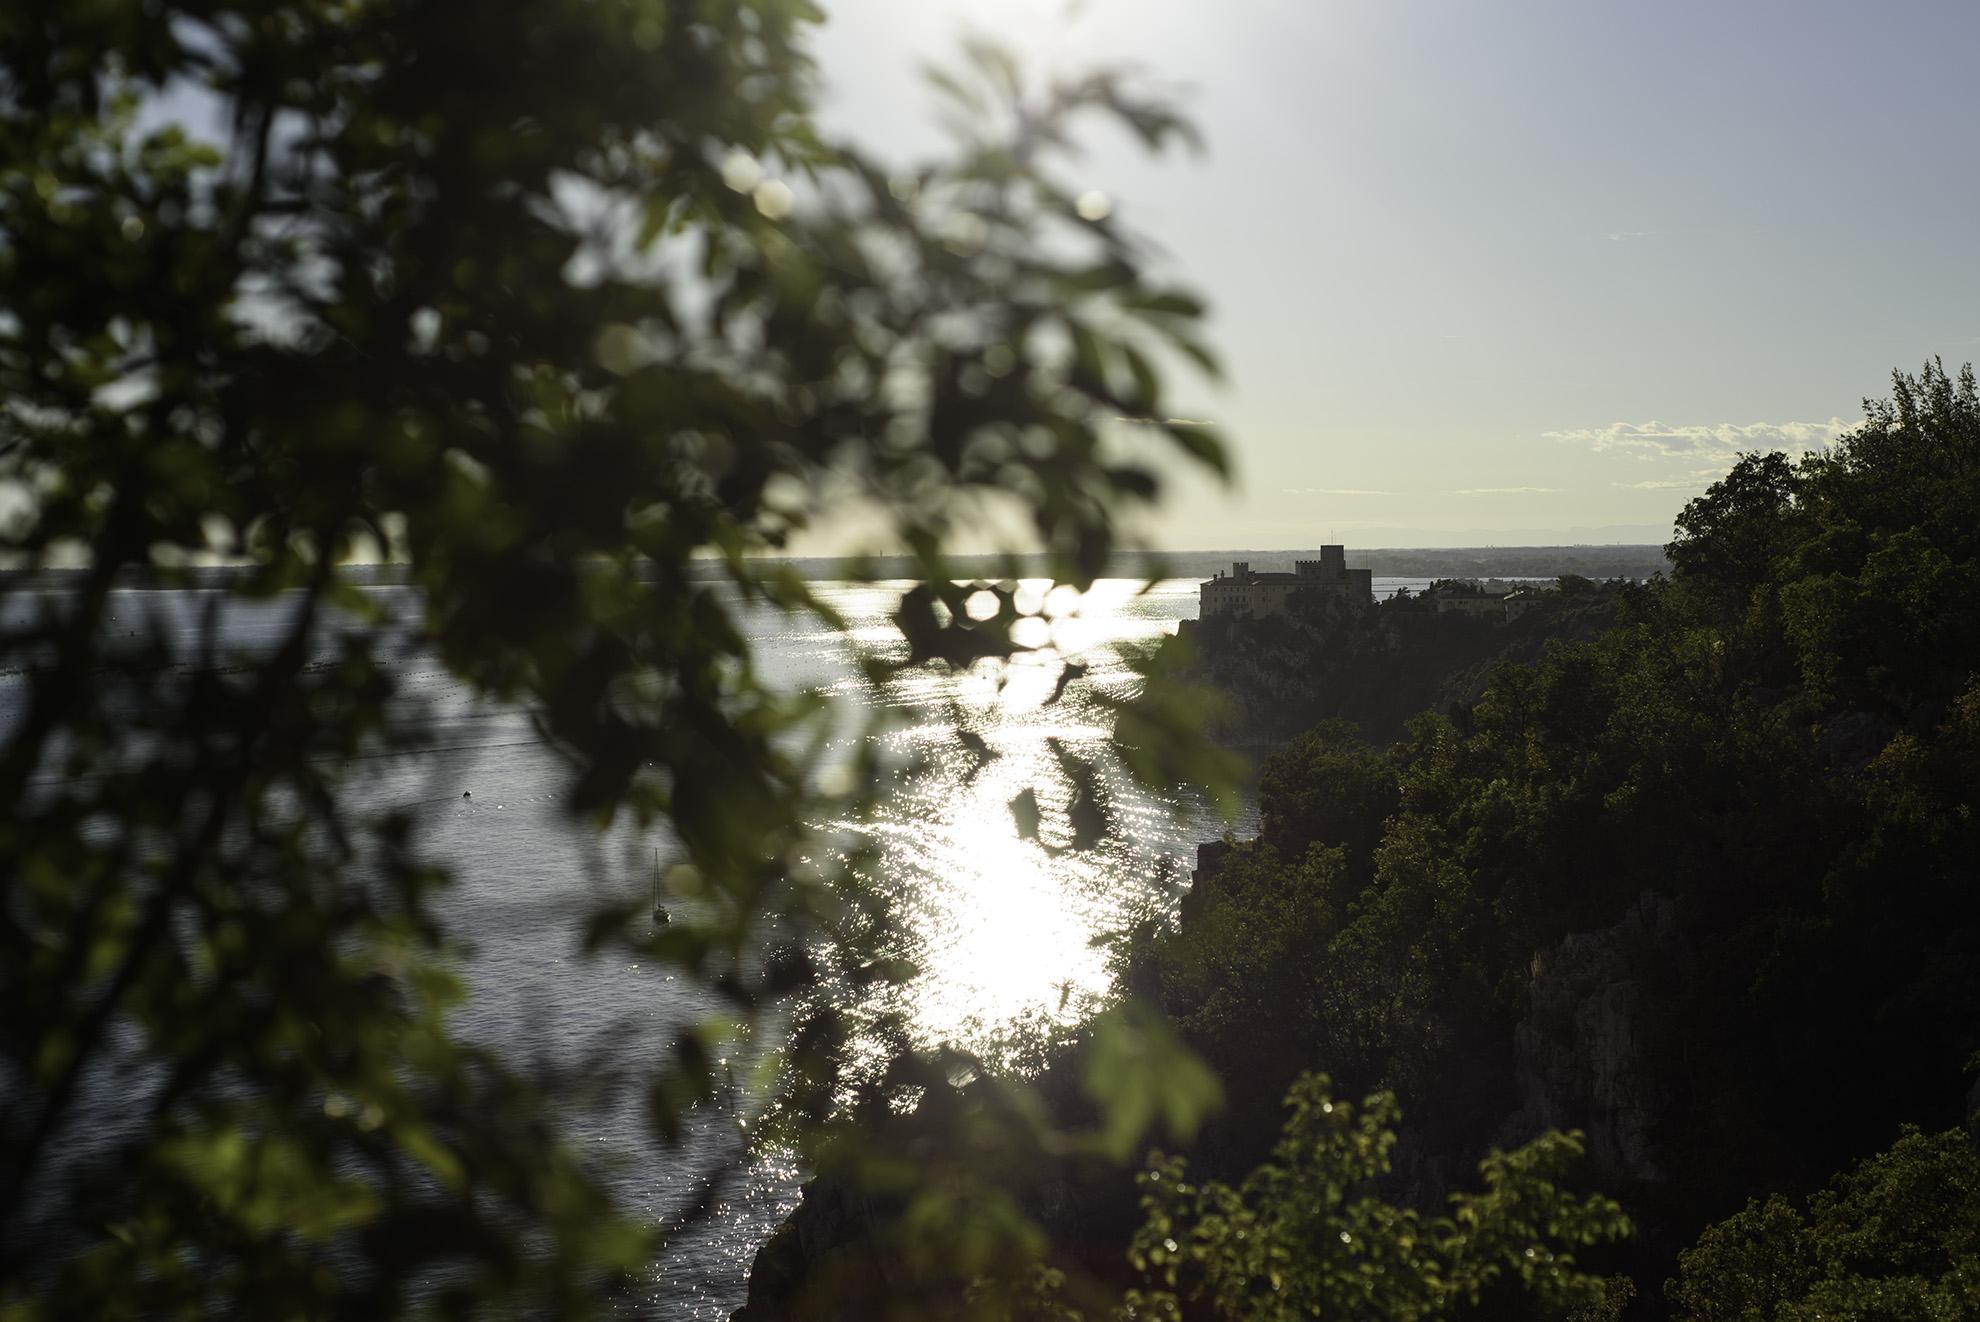 Sistiana - widok na zamek Duino